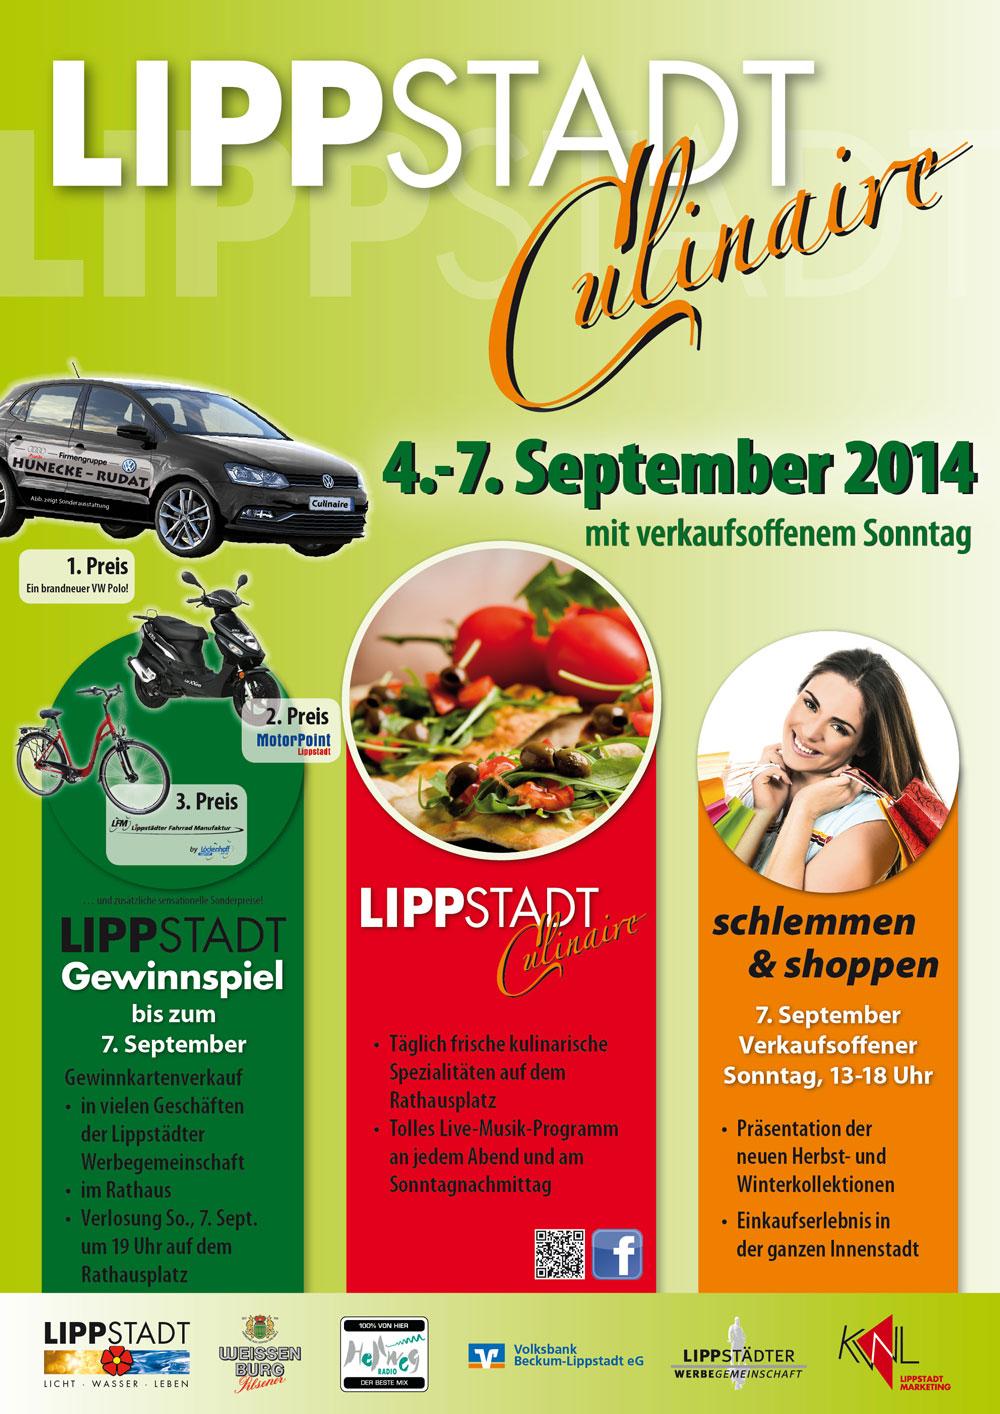 Lippstadt Culinaire 2014